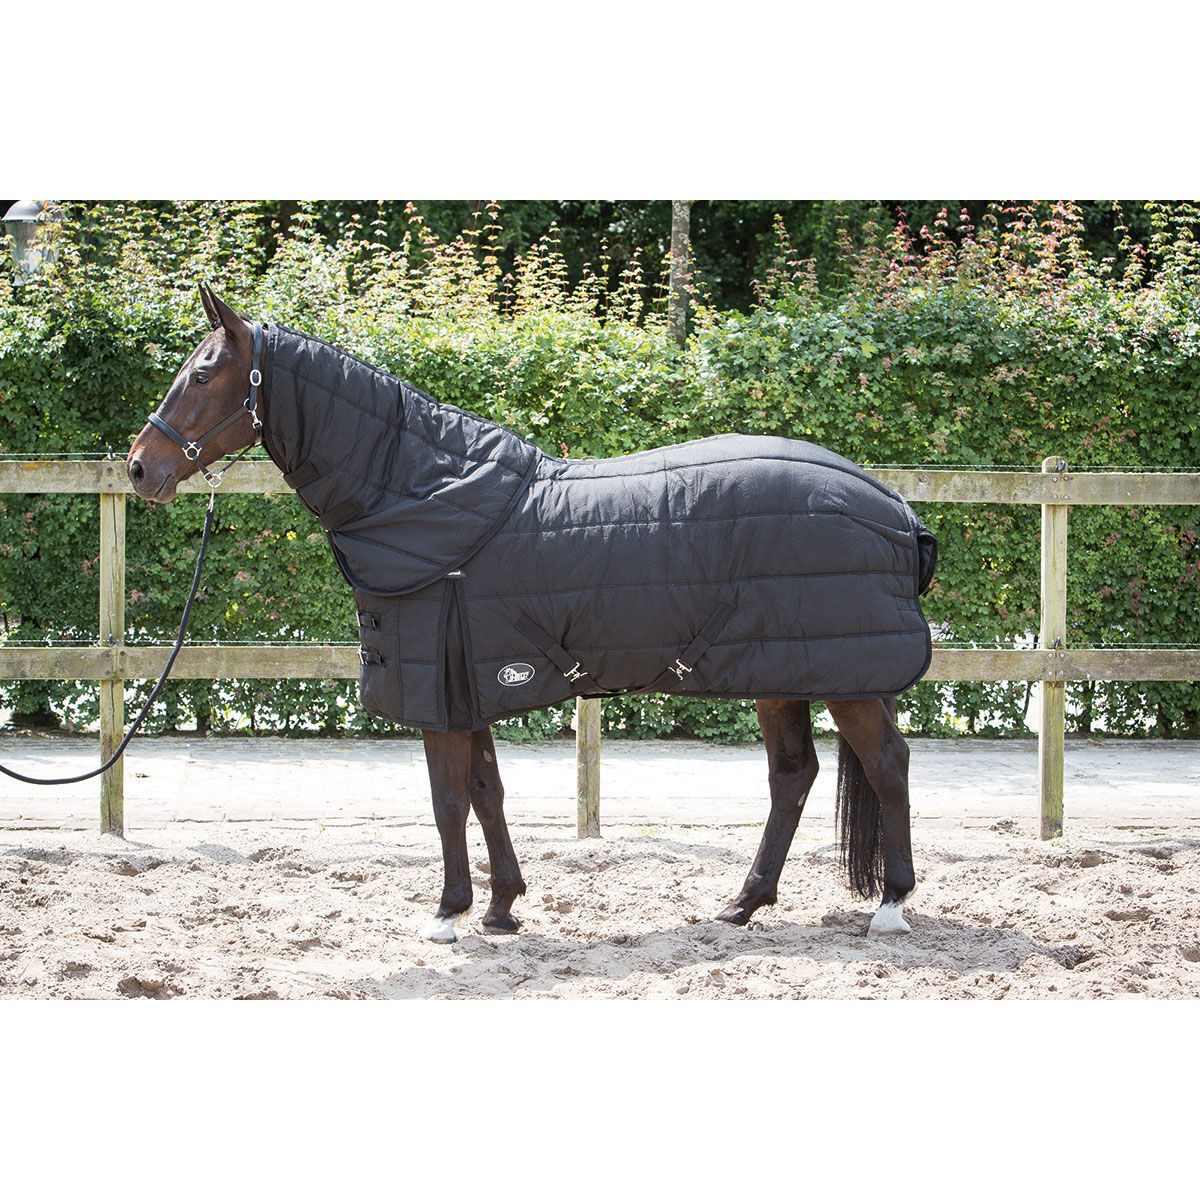 Stalldecke Highliner 300g Harrys Horse Thermodecke Winterdecke Unterziehdecke